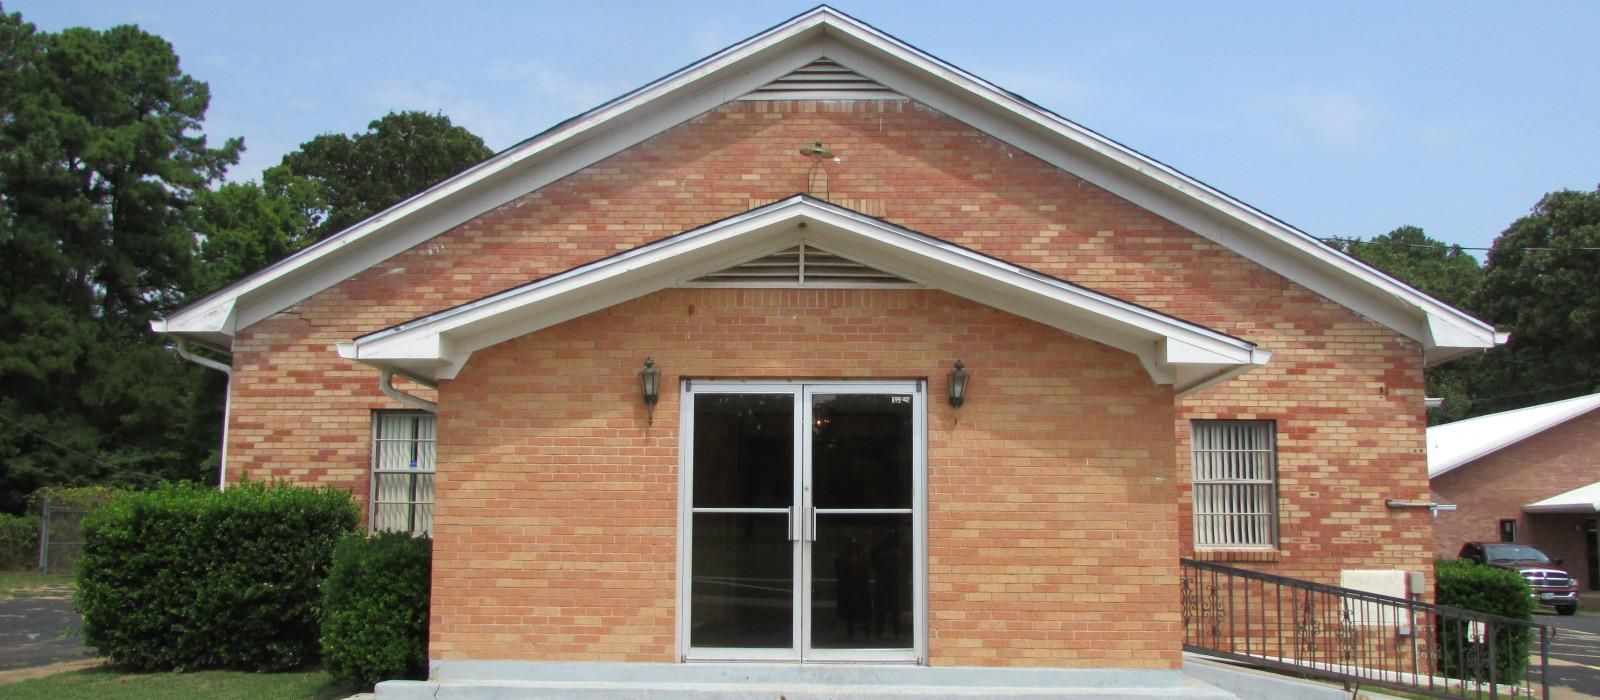 Churches Tyler TX